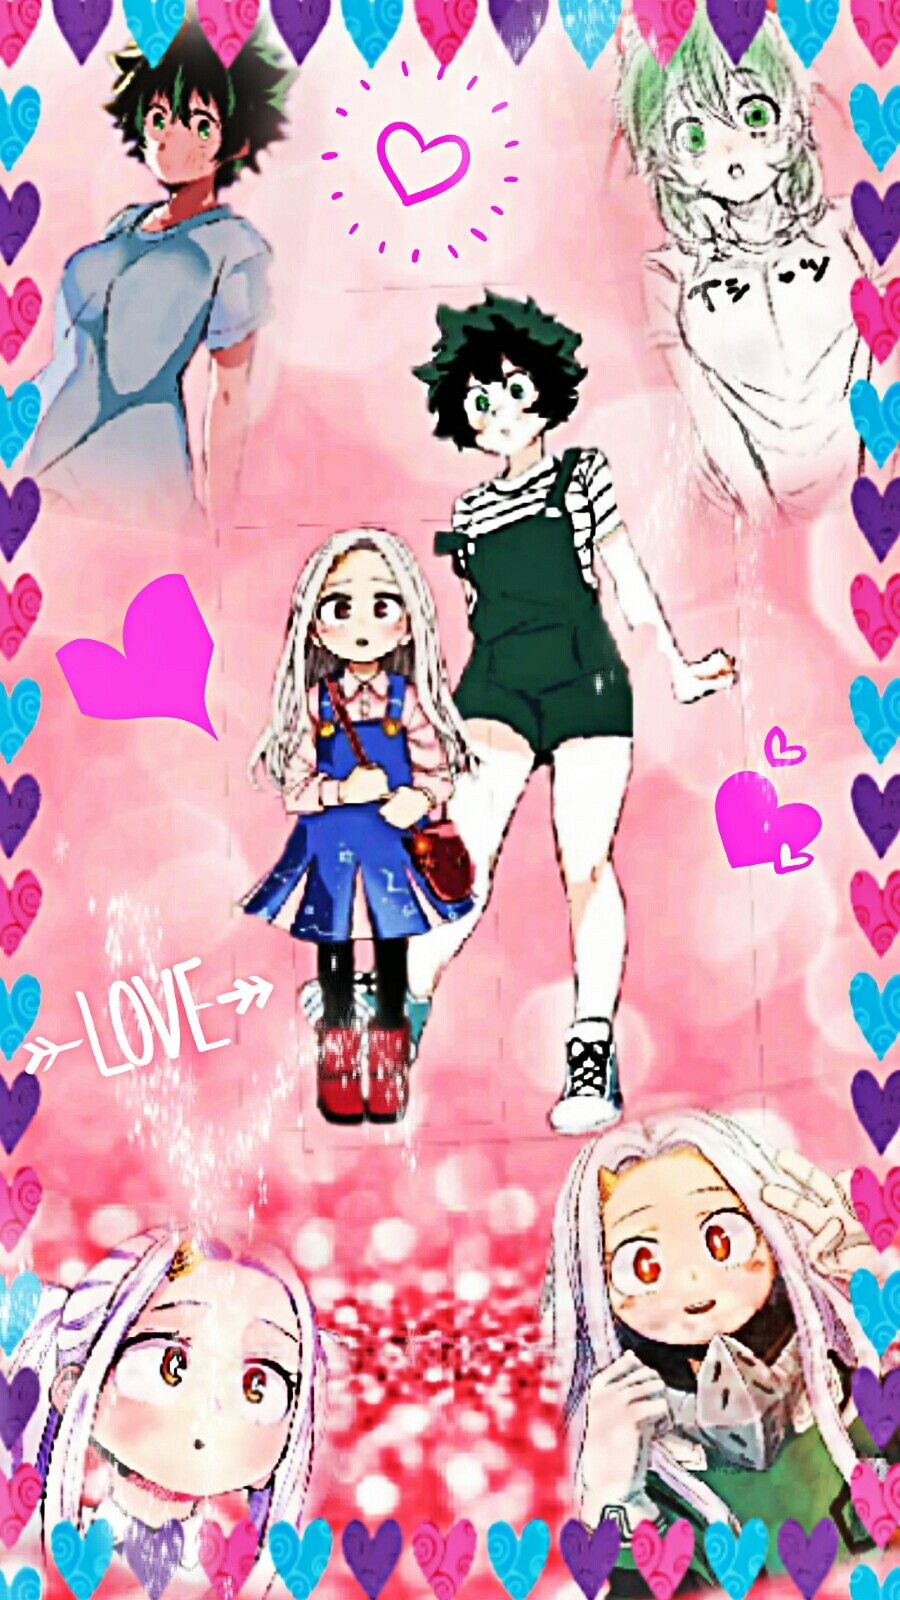 Pin by NanA on Wallpaper in 2020 Anime, Art, Wallpaper